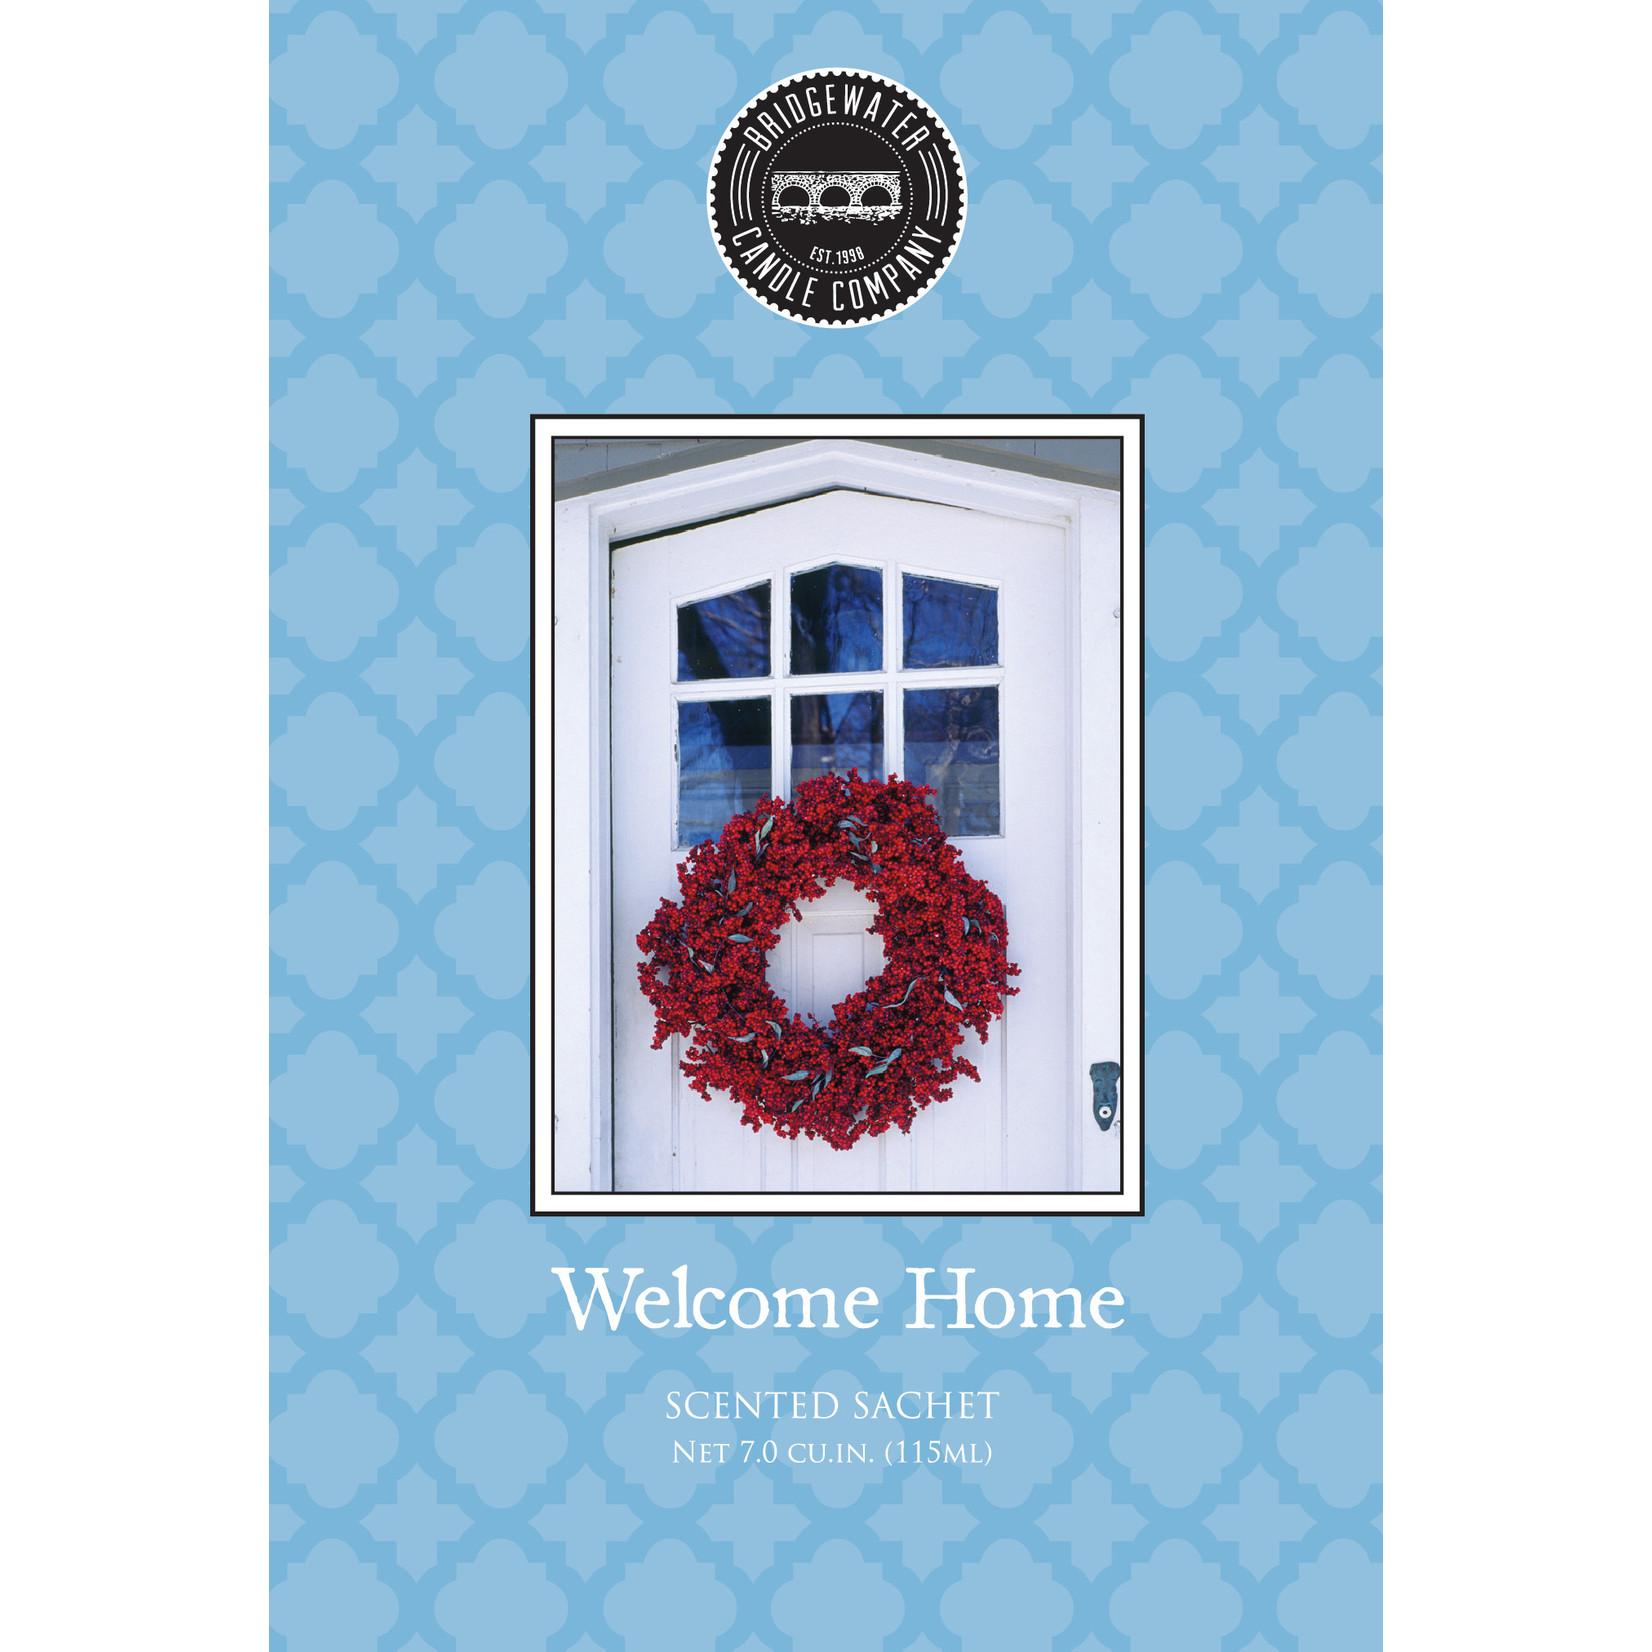 Bridgewater Scented Sachet / Geurzakje Welcome Home